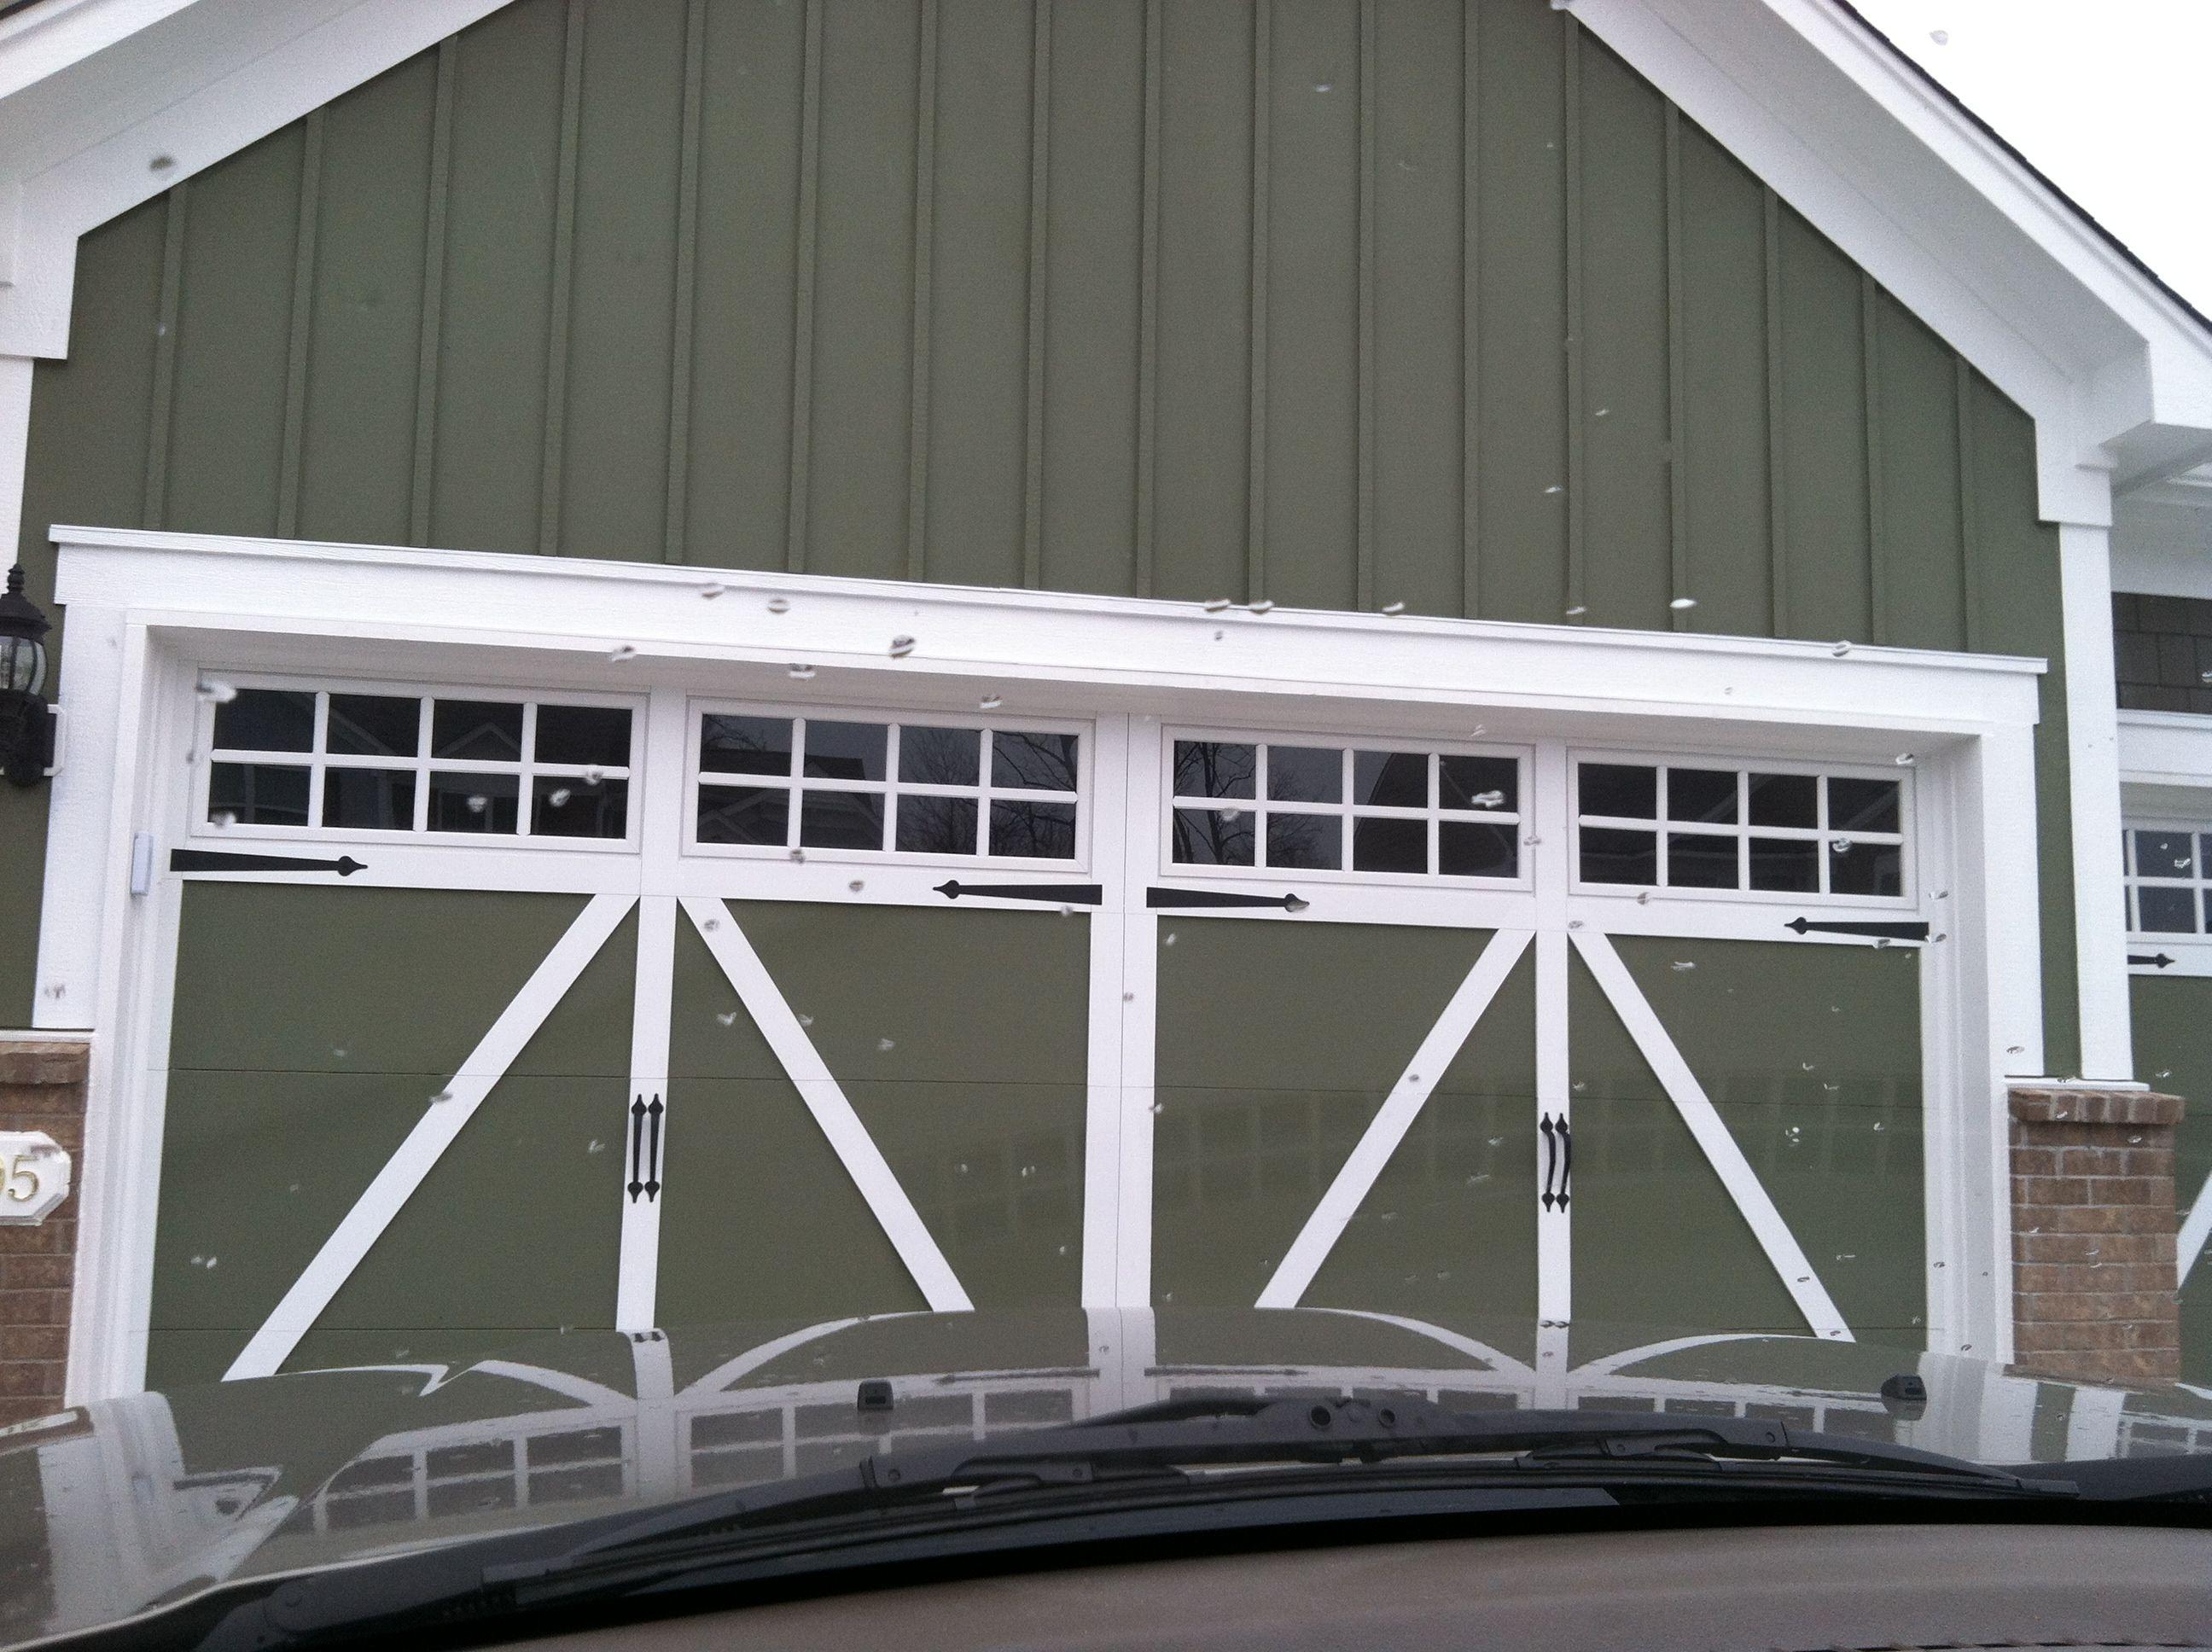 Barn garage doors dutch doors pinterest for Garages that look like barns